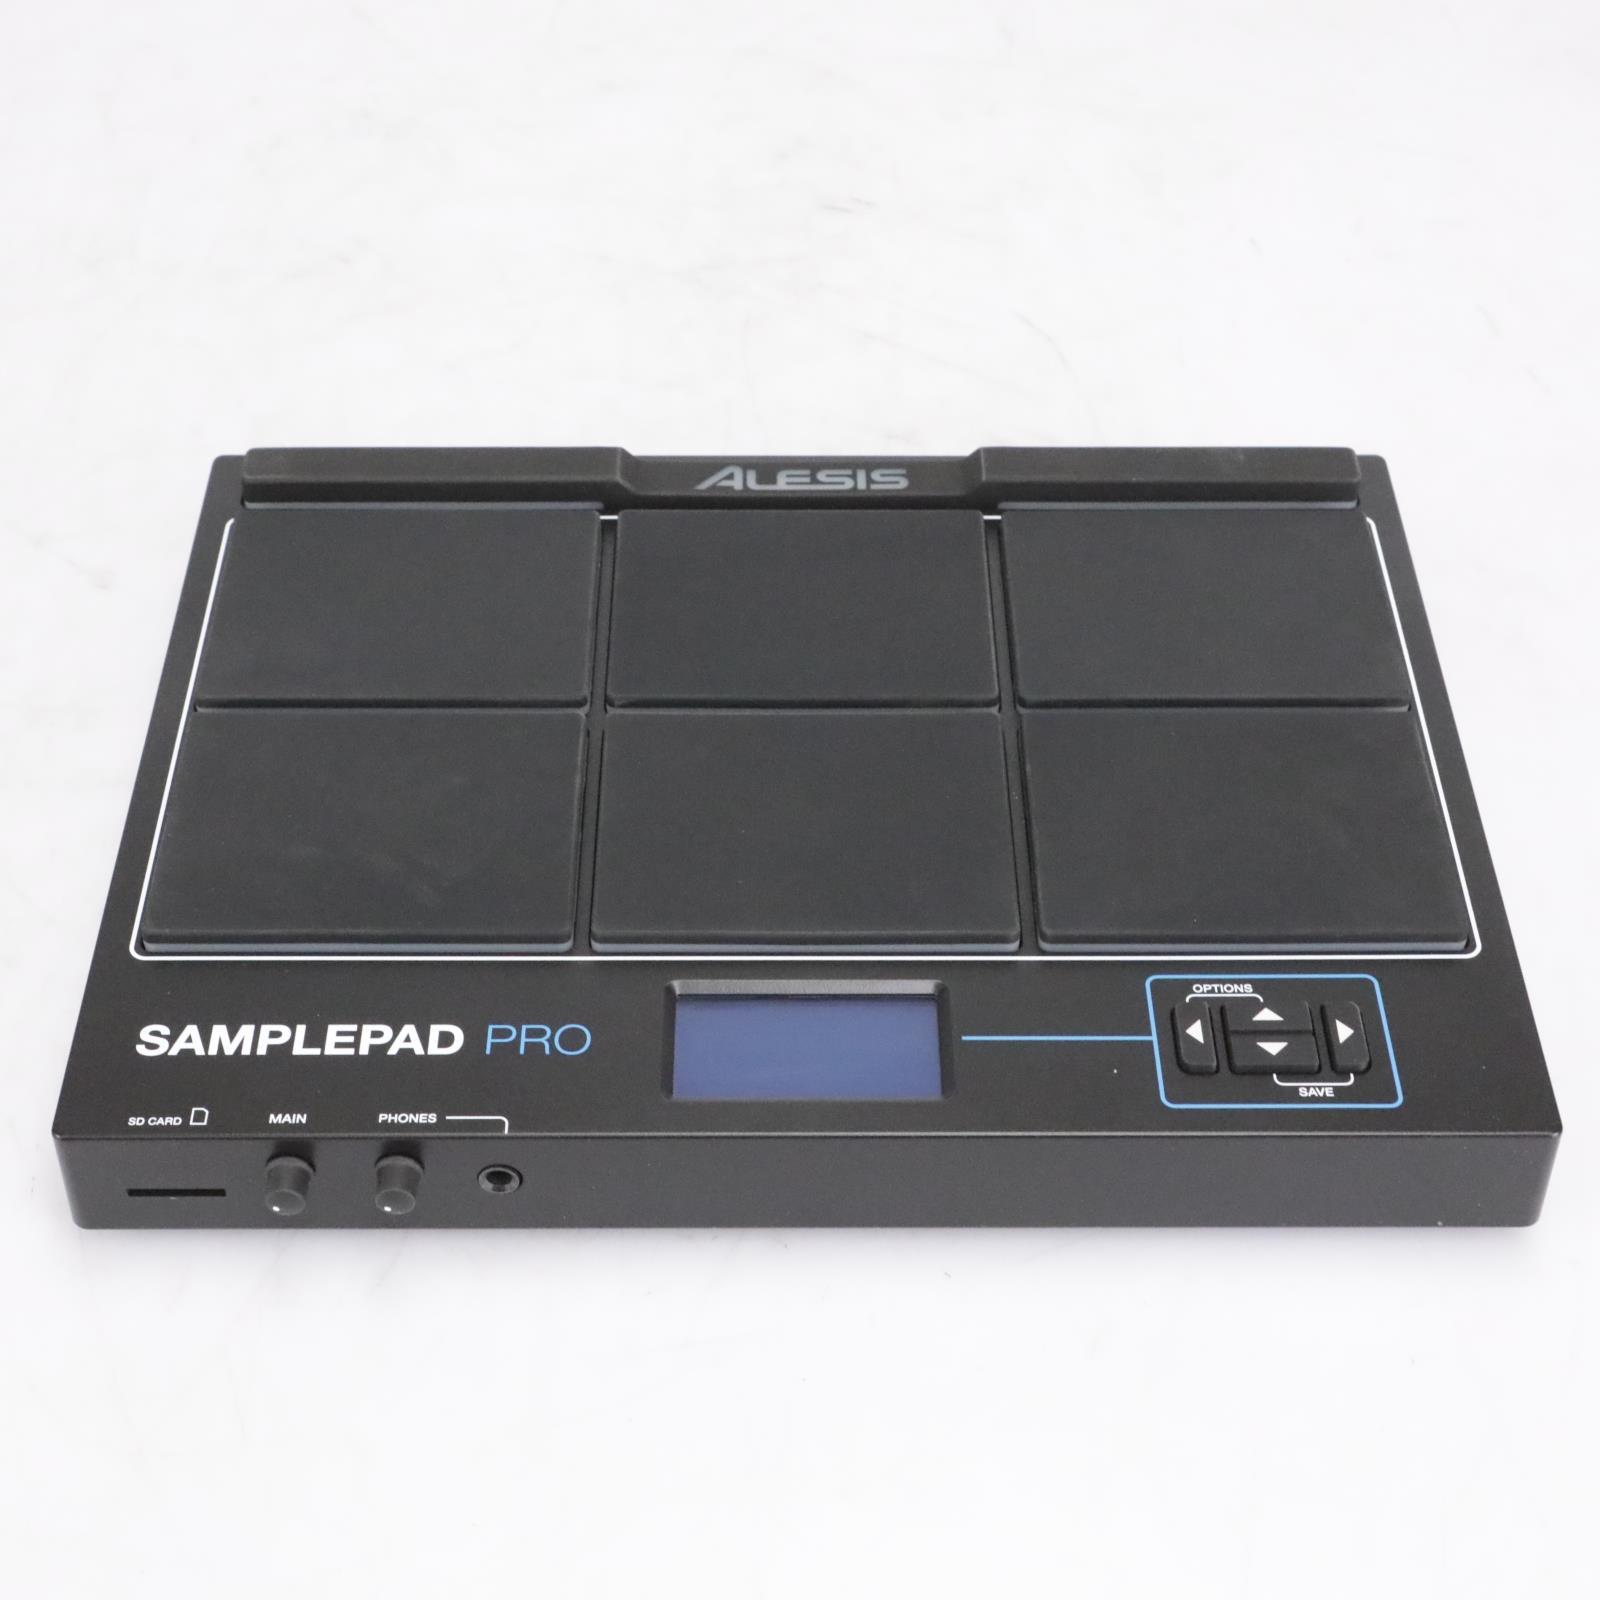 Alesis SamplePad Pro 8-Padded Drum Machine #42610